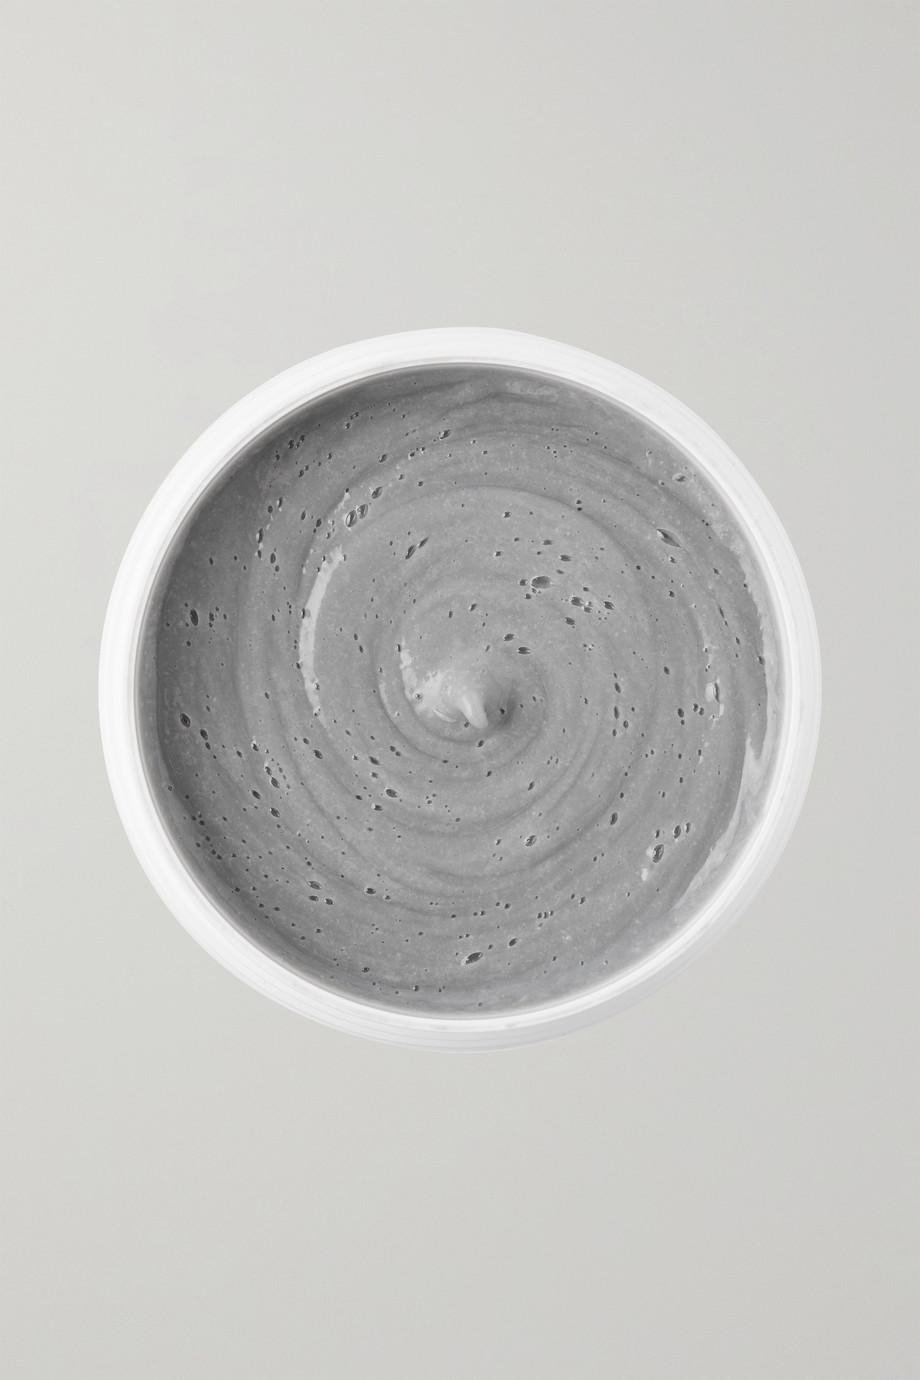 Briogeo Scalp Revival Charcoal + Coconut Oil Micro-Exfoliating Shampoo, 236ml